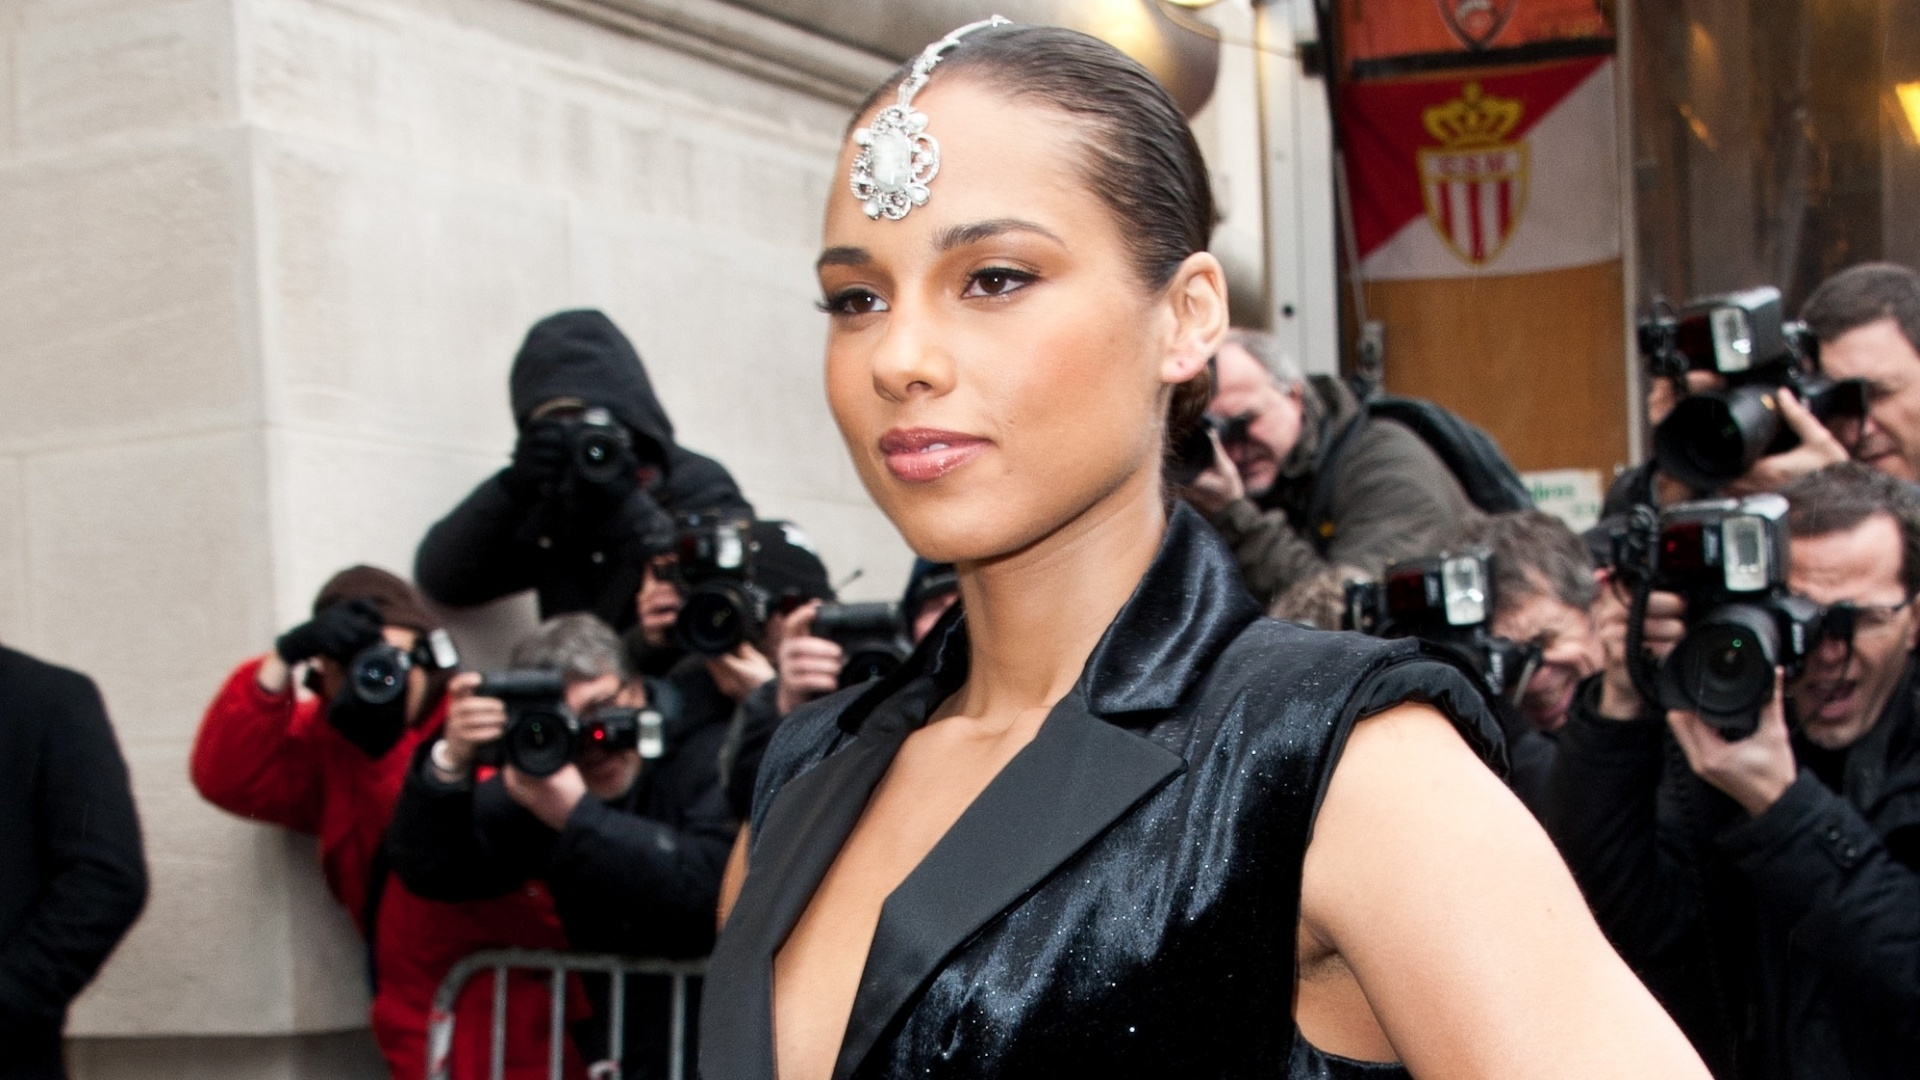 A cantora Alicia Keys chega para o desfile da Chanel, durante a Semana de Moda de Paris (5/3/12)